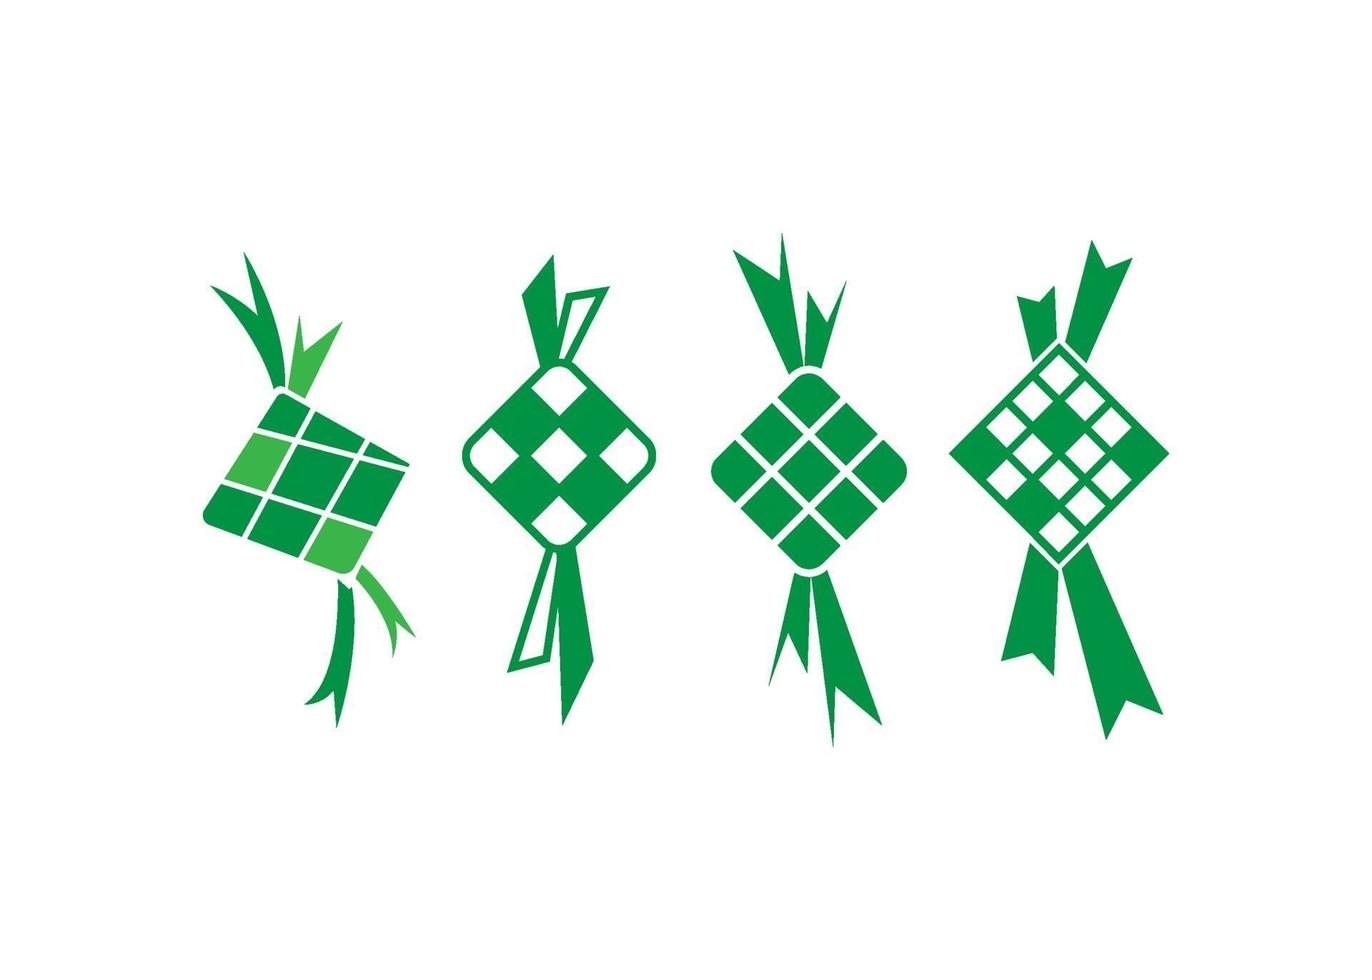 ketupat pictogram illustratie vector set